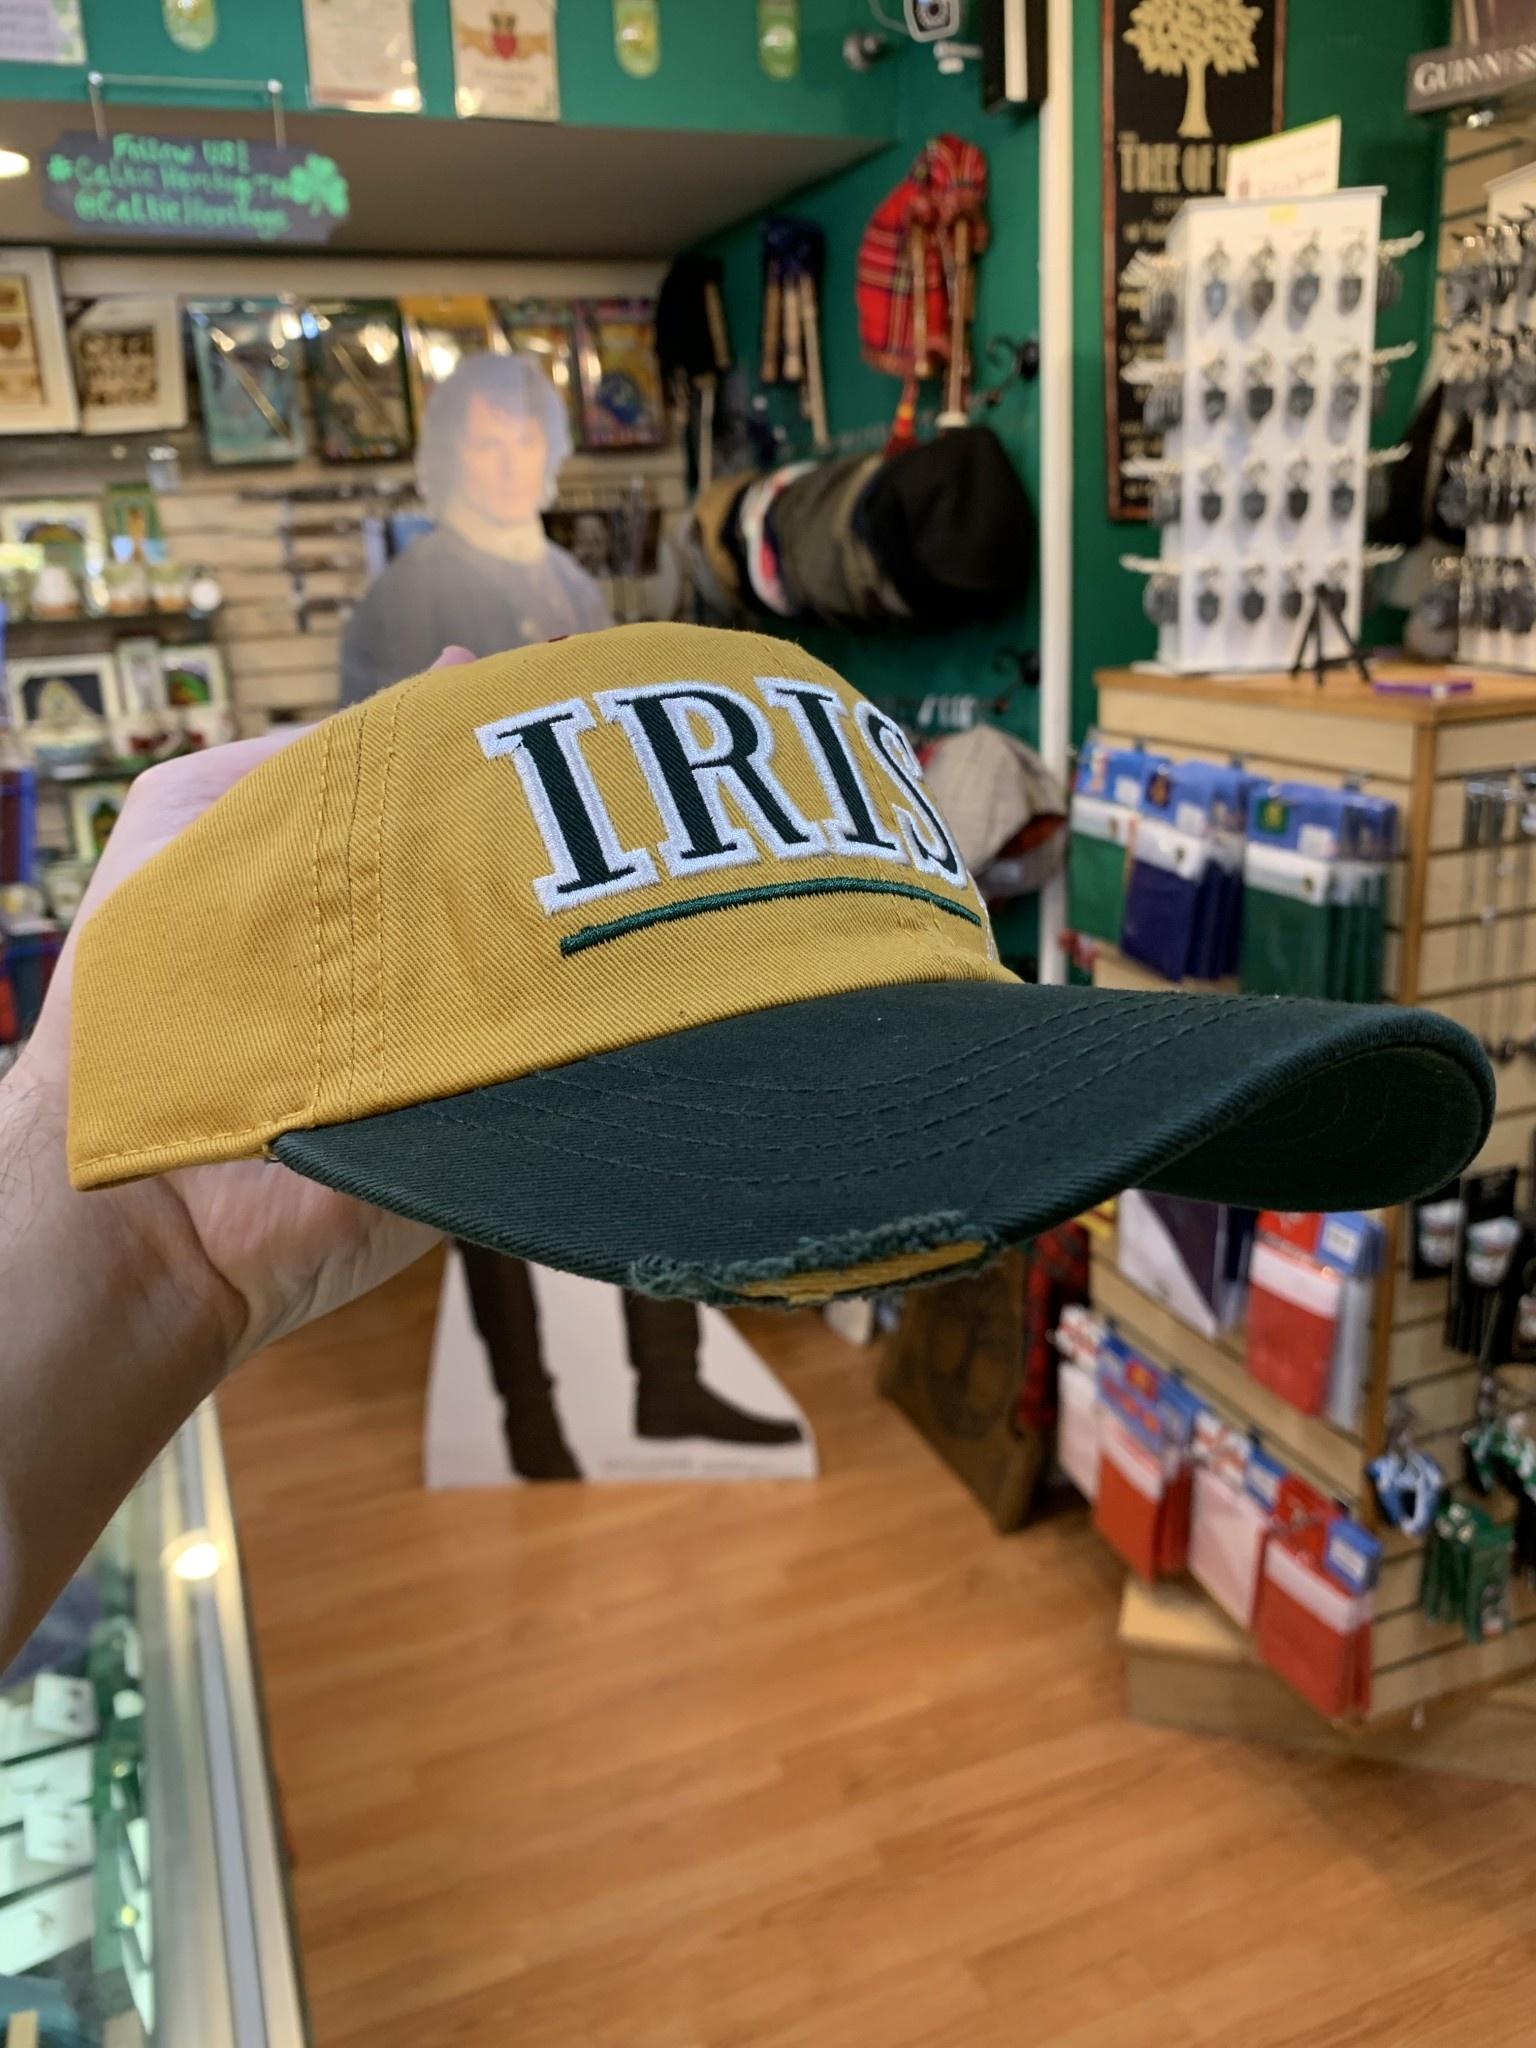 Hat: Irish Slainte, Mustard, Baseball